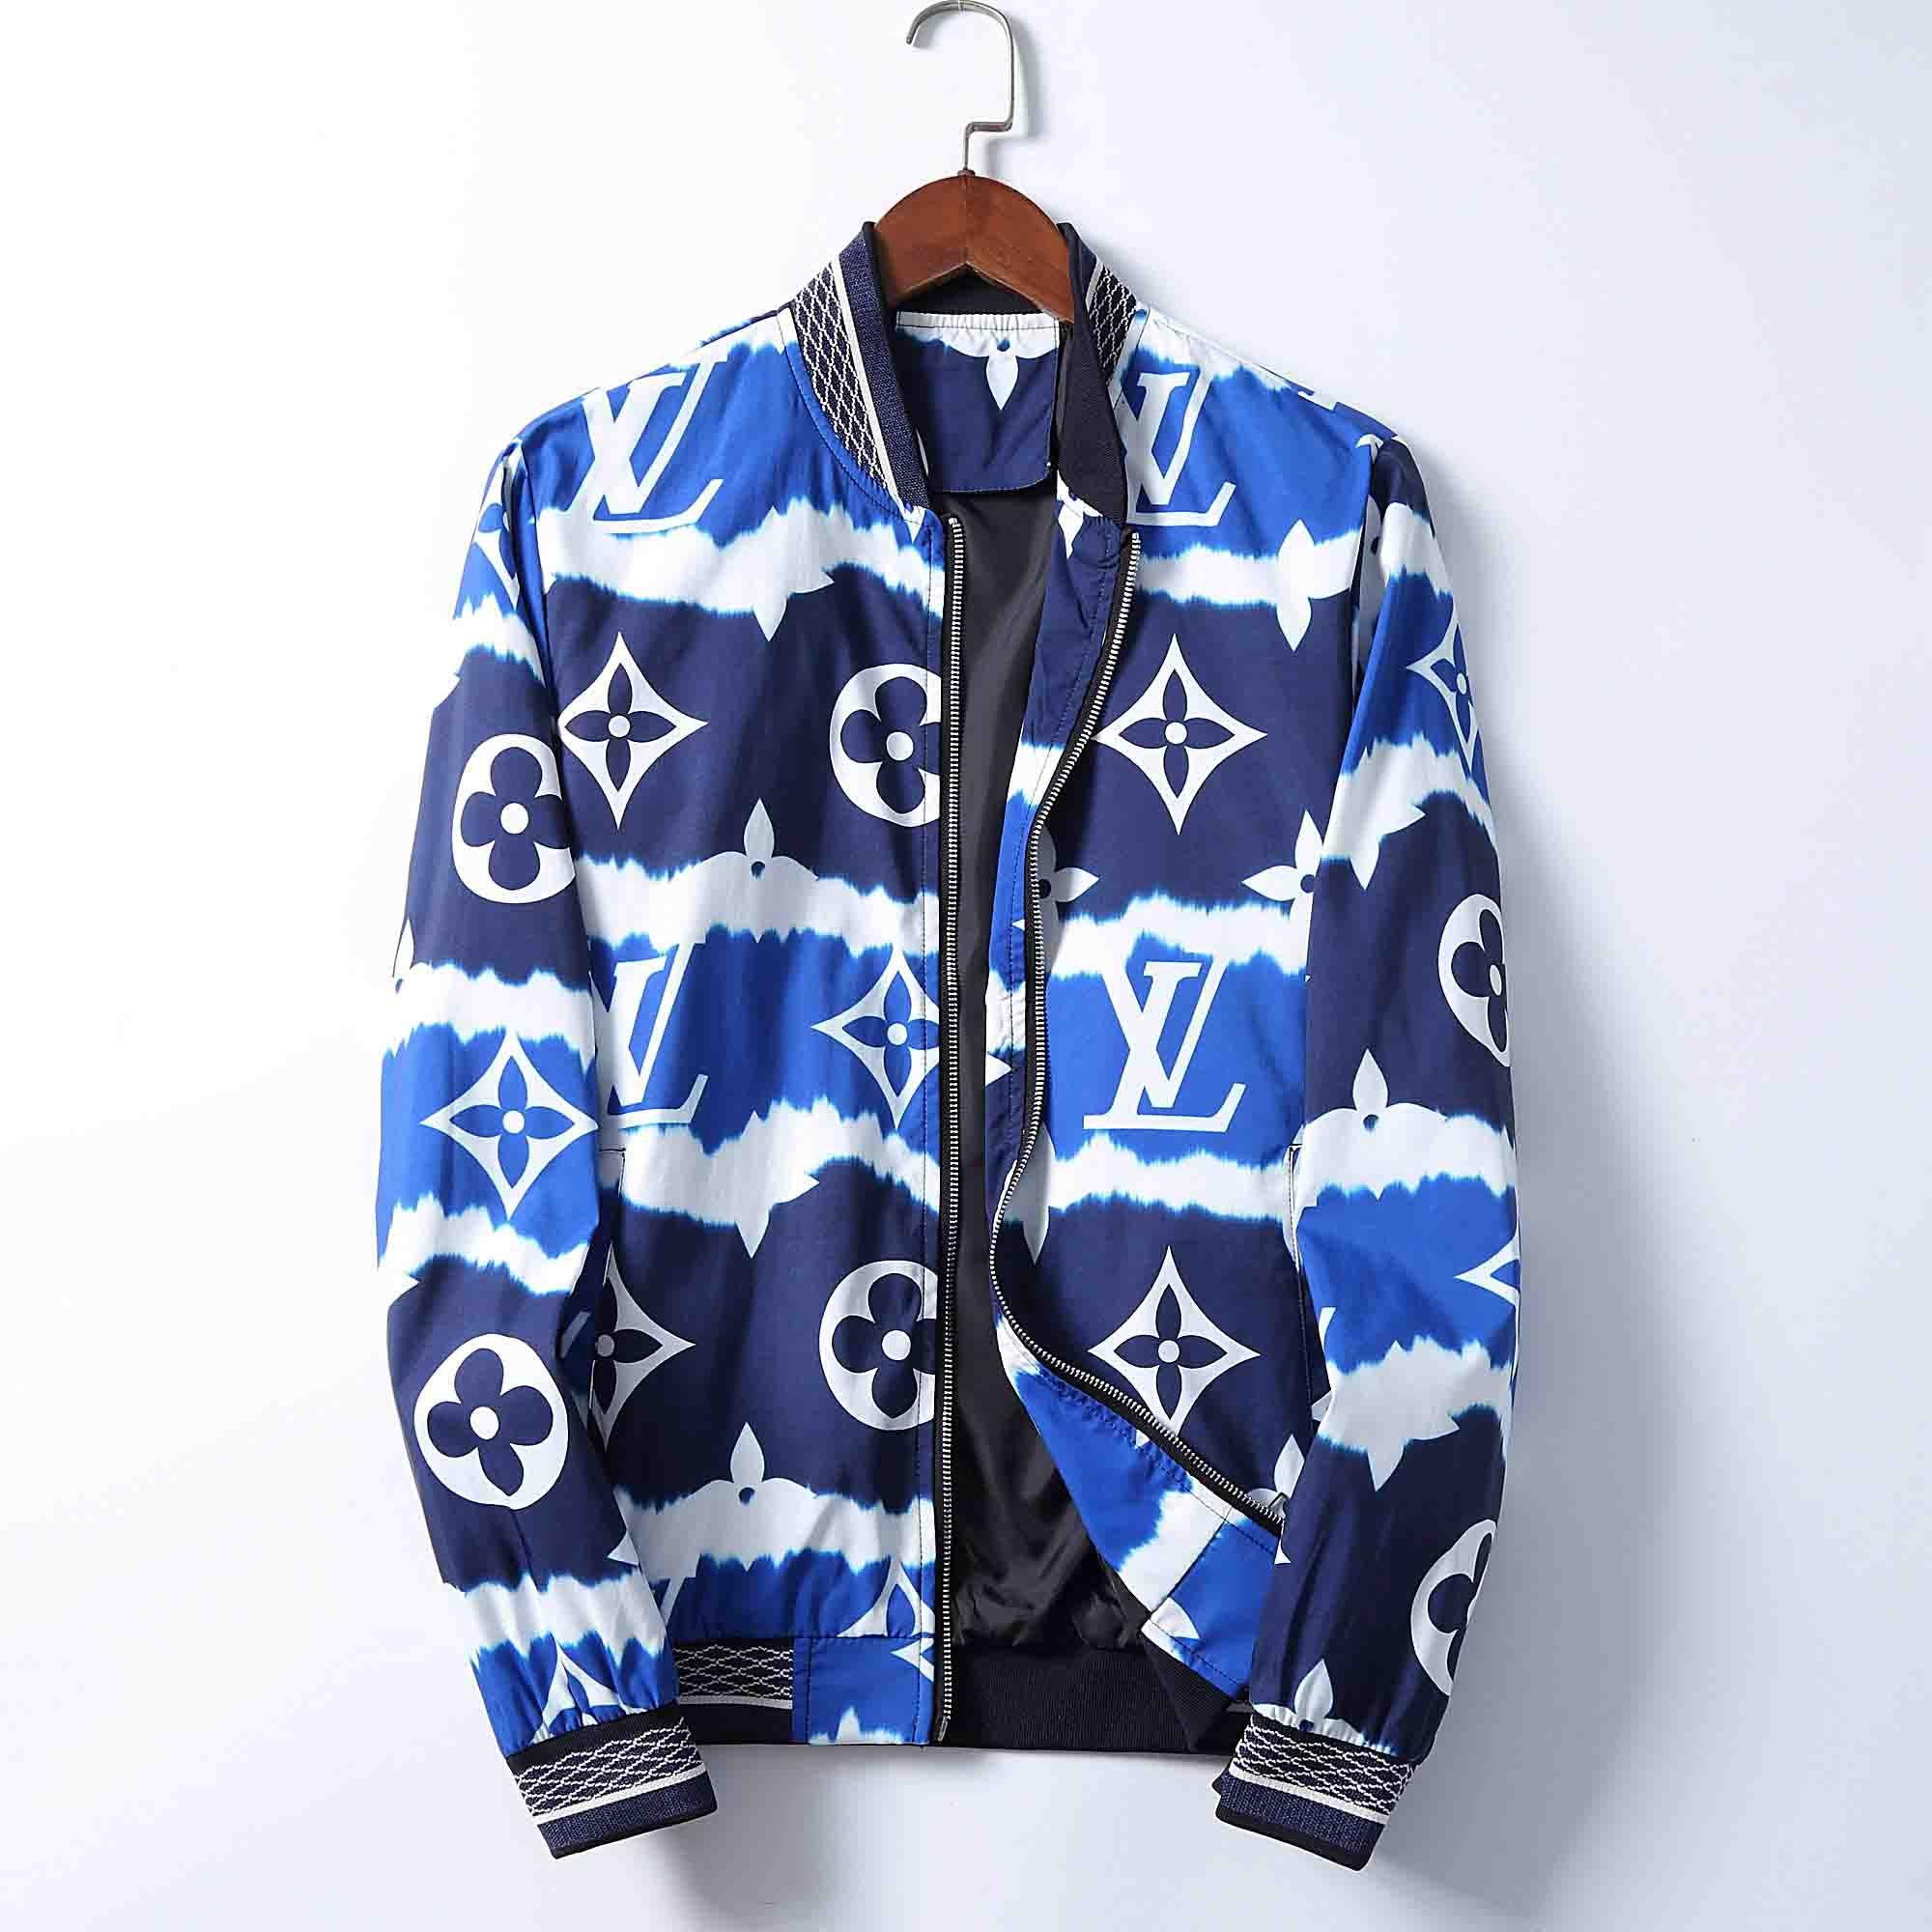 2020 Modedesigner-Jacke Windjacke Langarm-Herren Jacken Hoodie Kleidung Zipper mit Animal Letter-Muster Plus Size Kleidung M-3XL